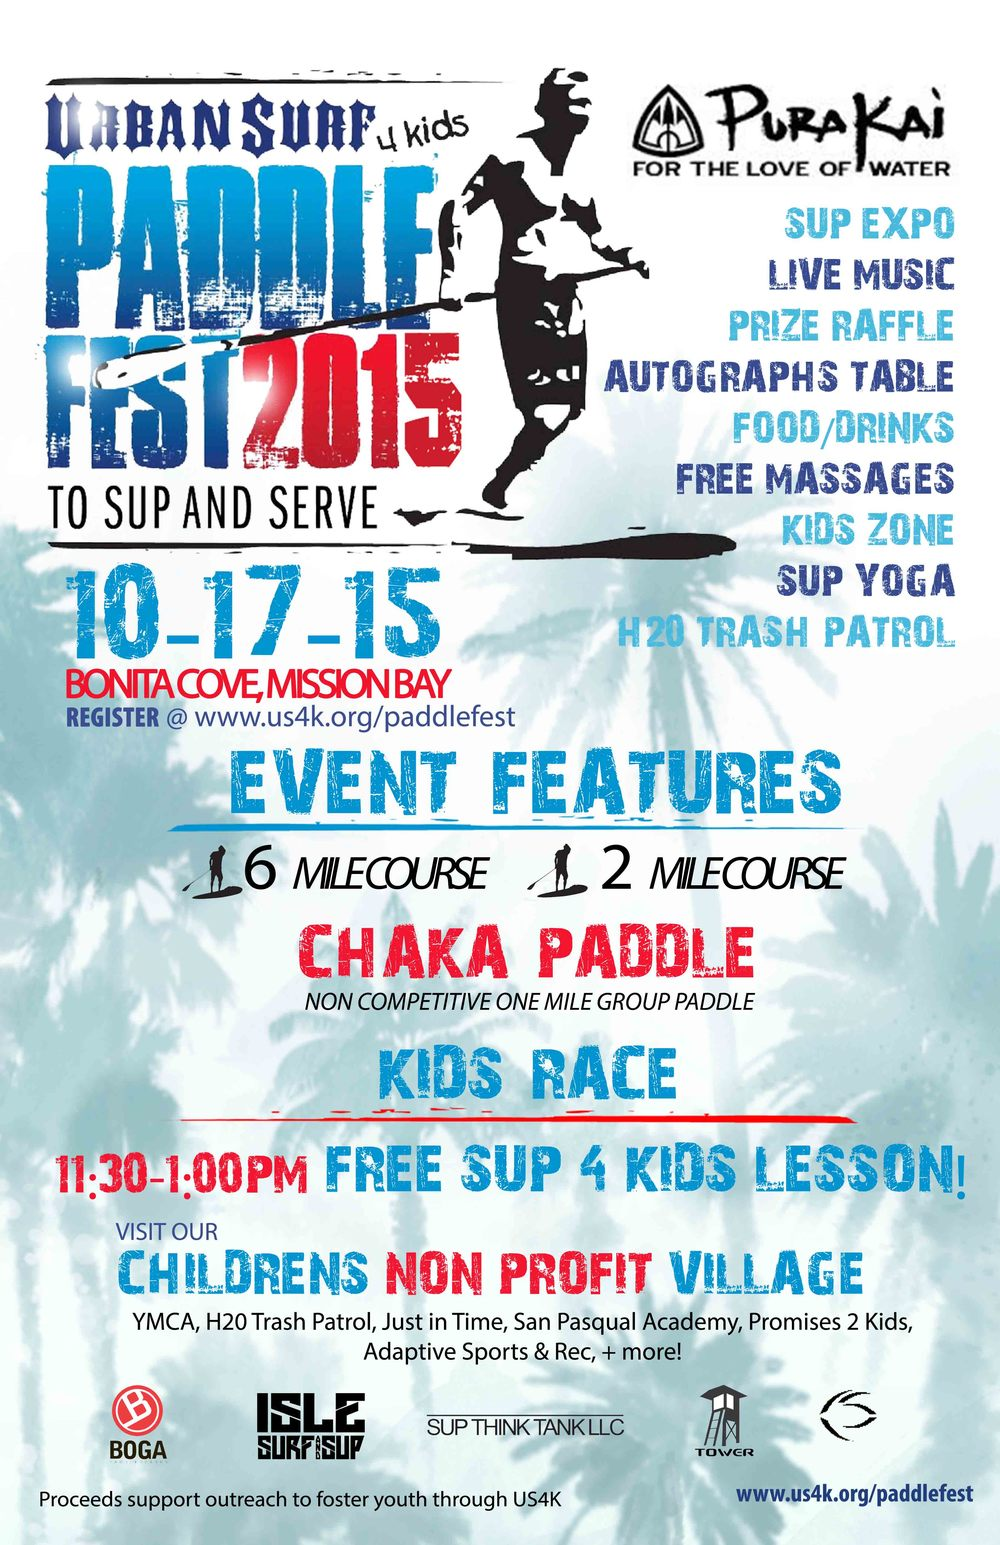 2015 UrbanSurf4Kids poster